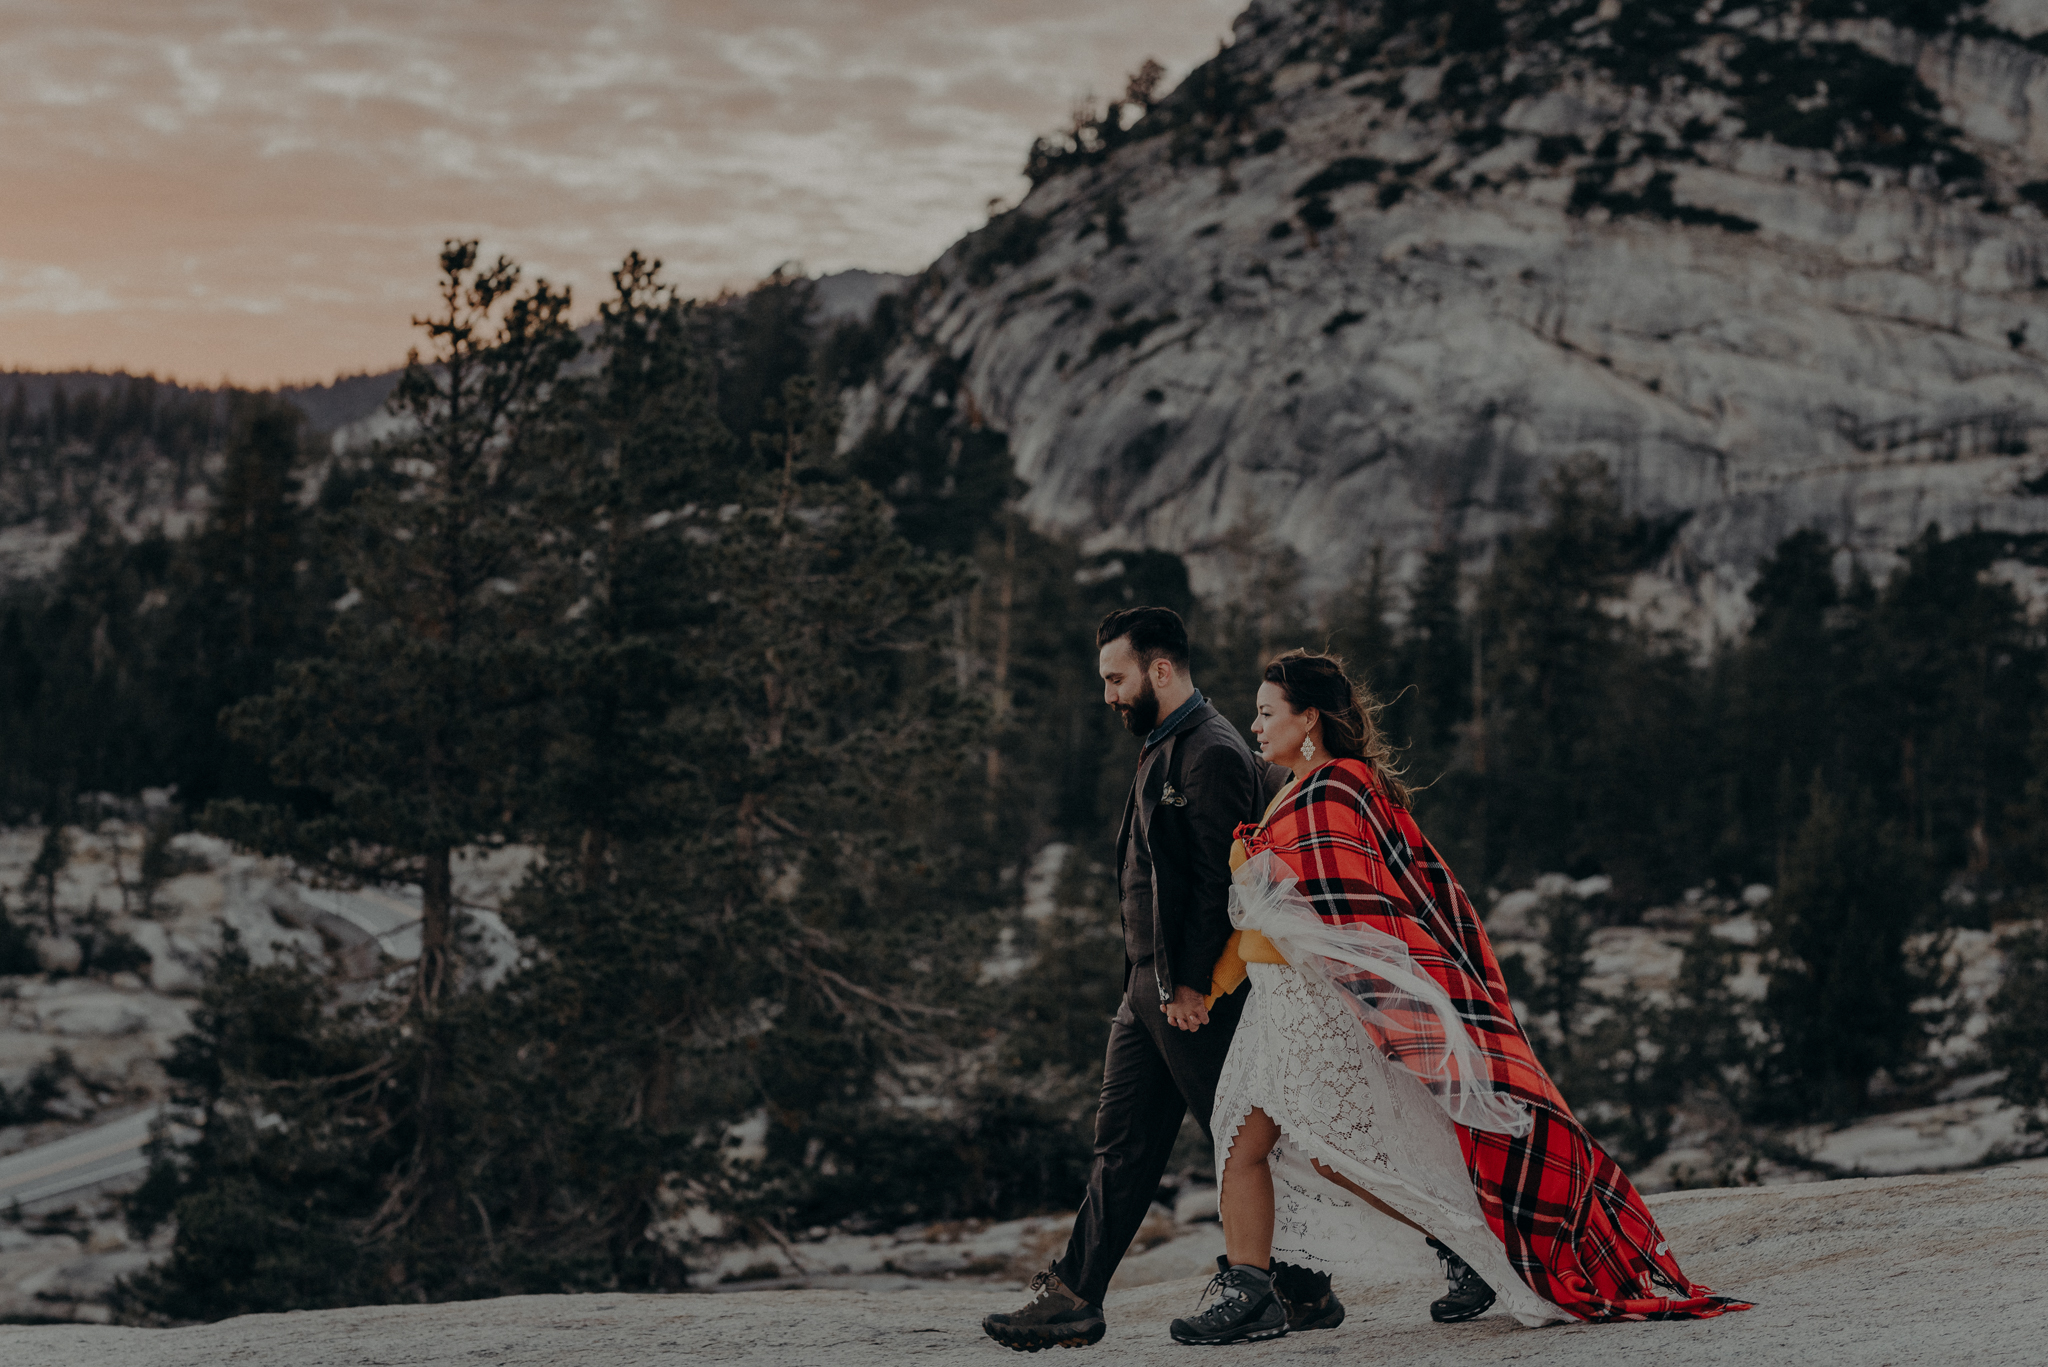 Yosemite Elopement Photographer - Evergreen Lodge Wedding Photographer - IsaiahAndTaylor.com-058.jpg